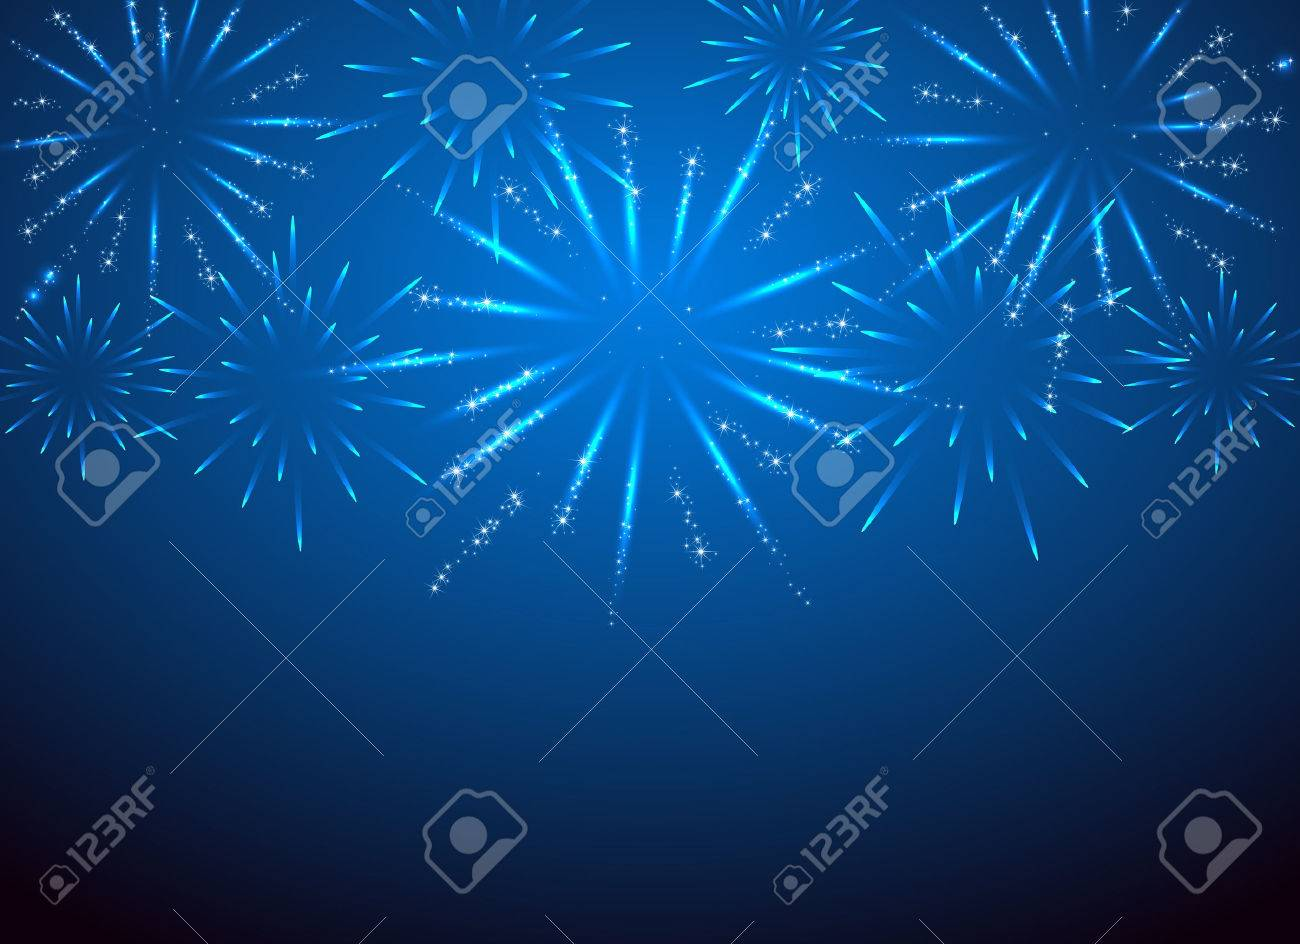 Sparkle fireworks on the blue background, illustration. Stock Vector - 42141507